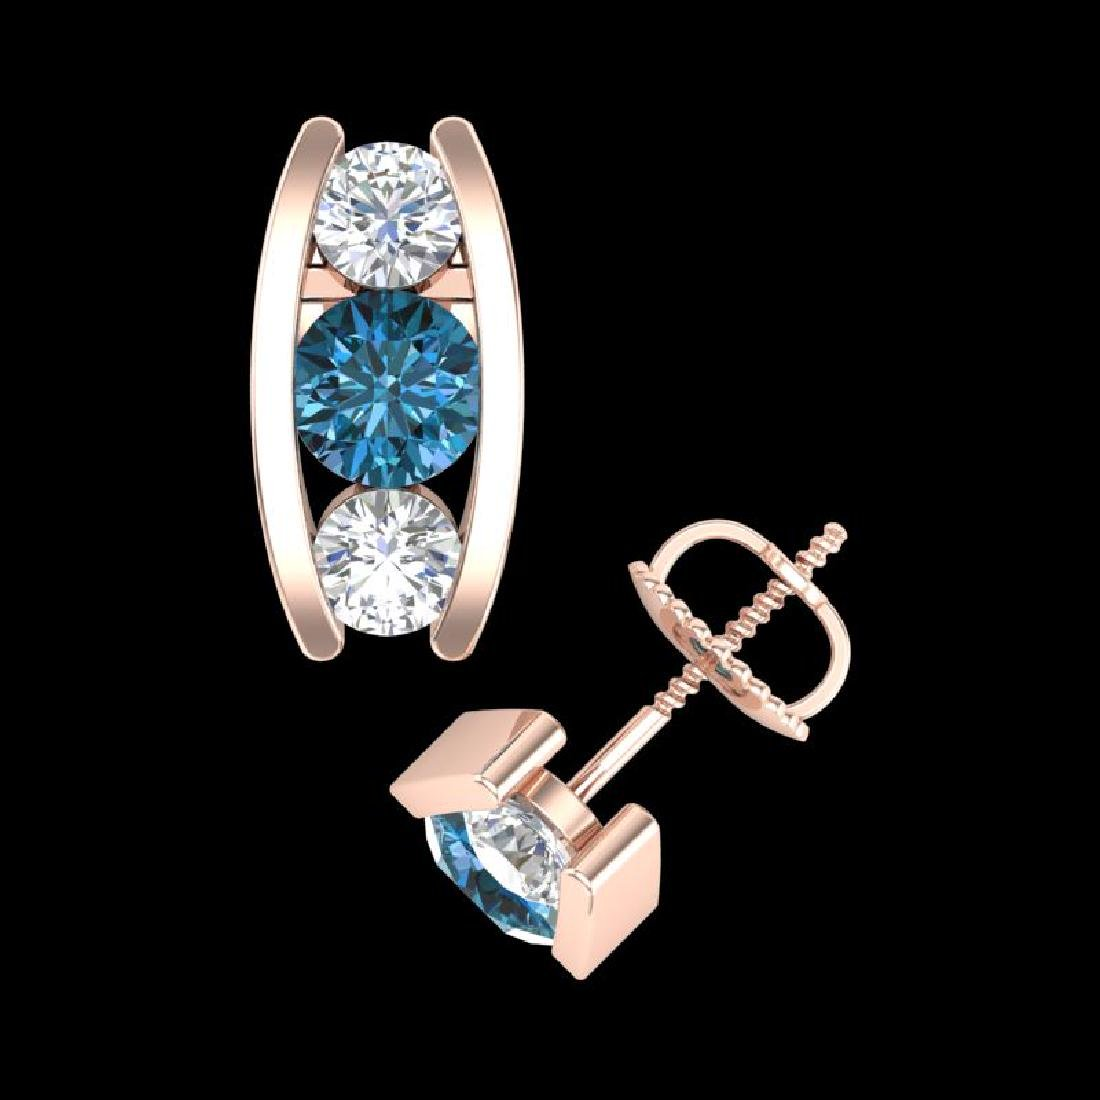 2.18 CTW Fancy Intense Blue Diamond Art Deco Stud - 3